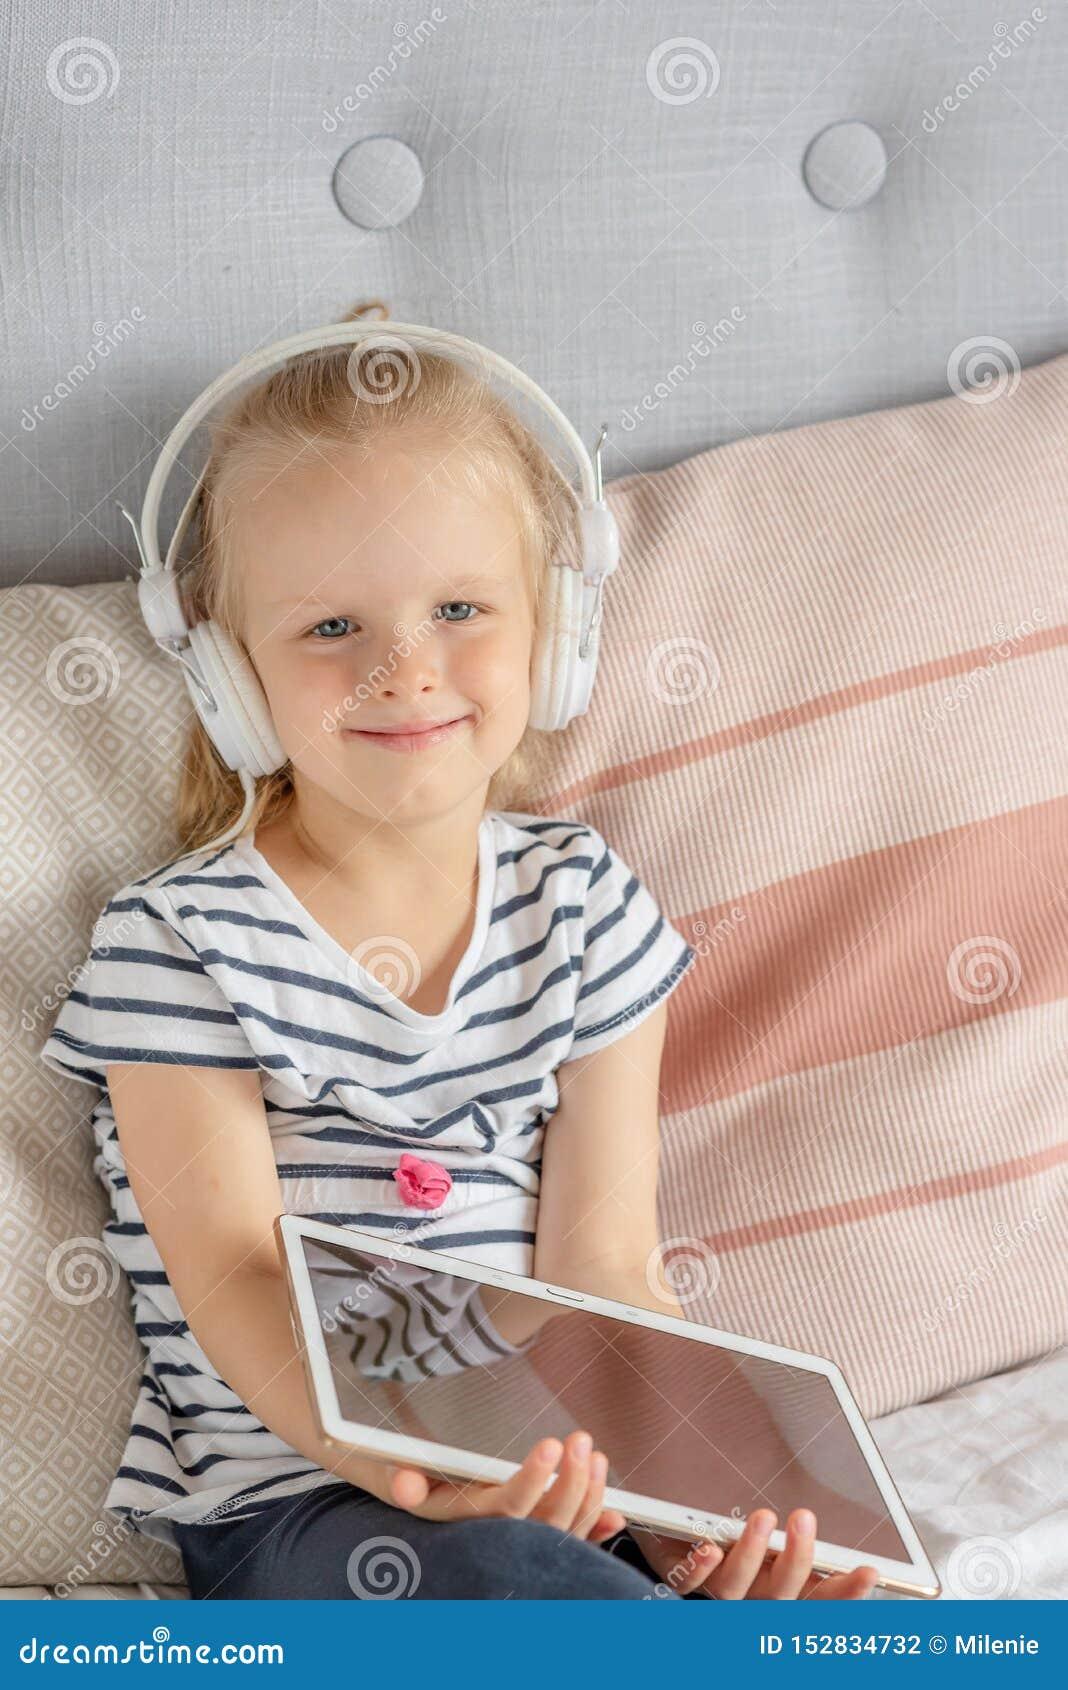 Kaukasisch Meisje in Hoofdtelefoon het Letten op Tablet in Bed